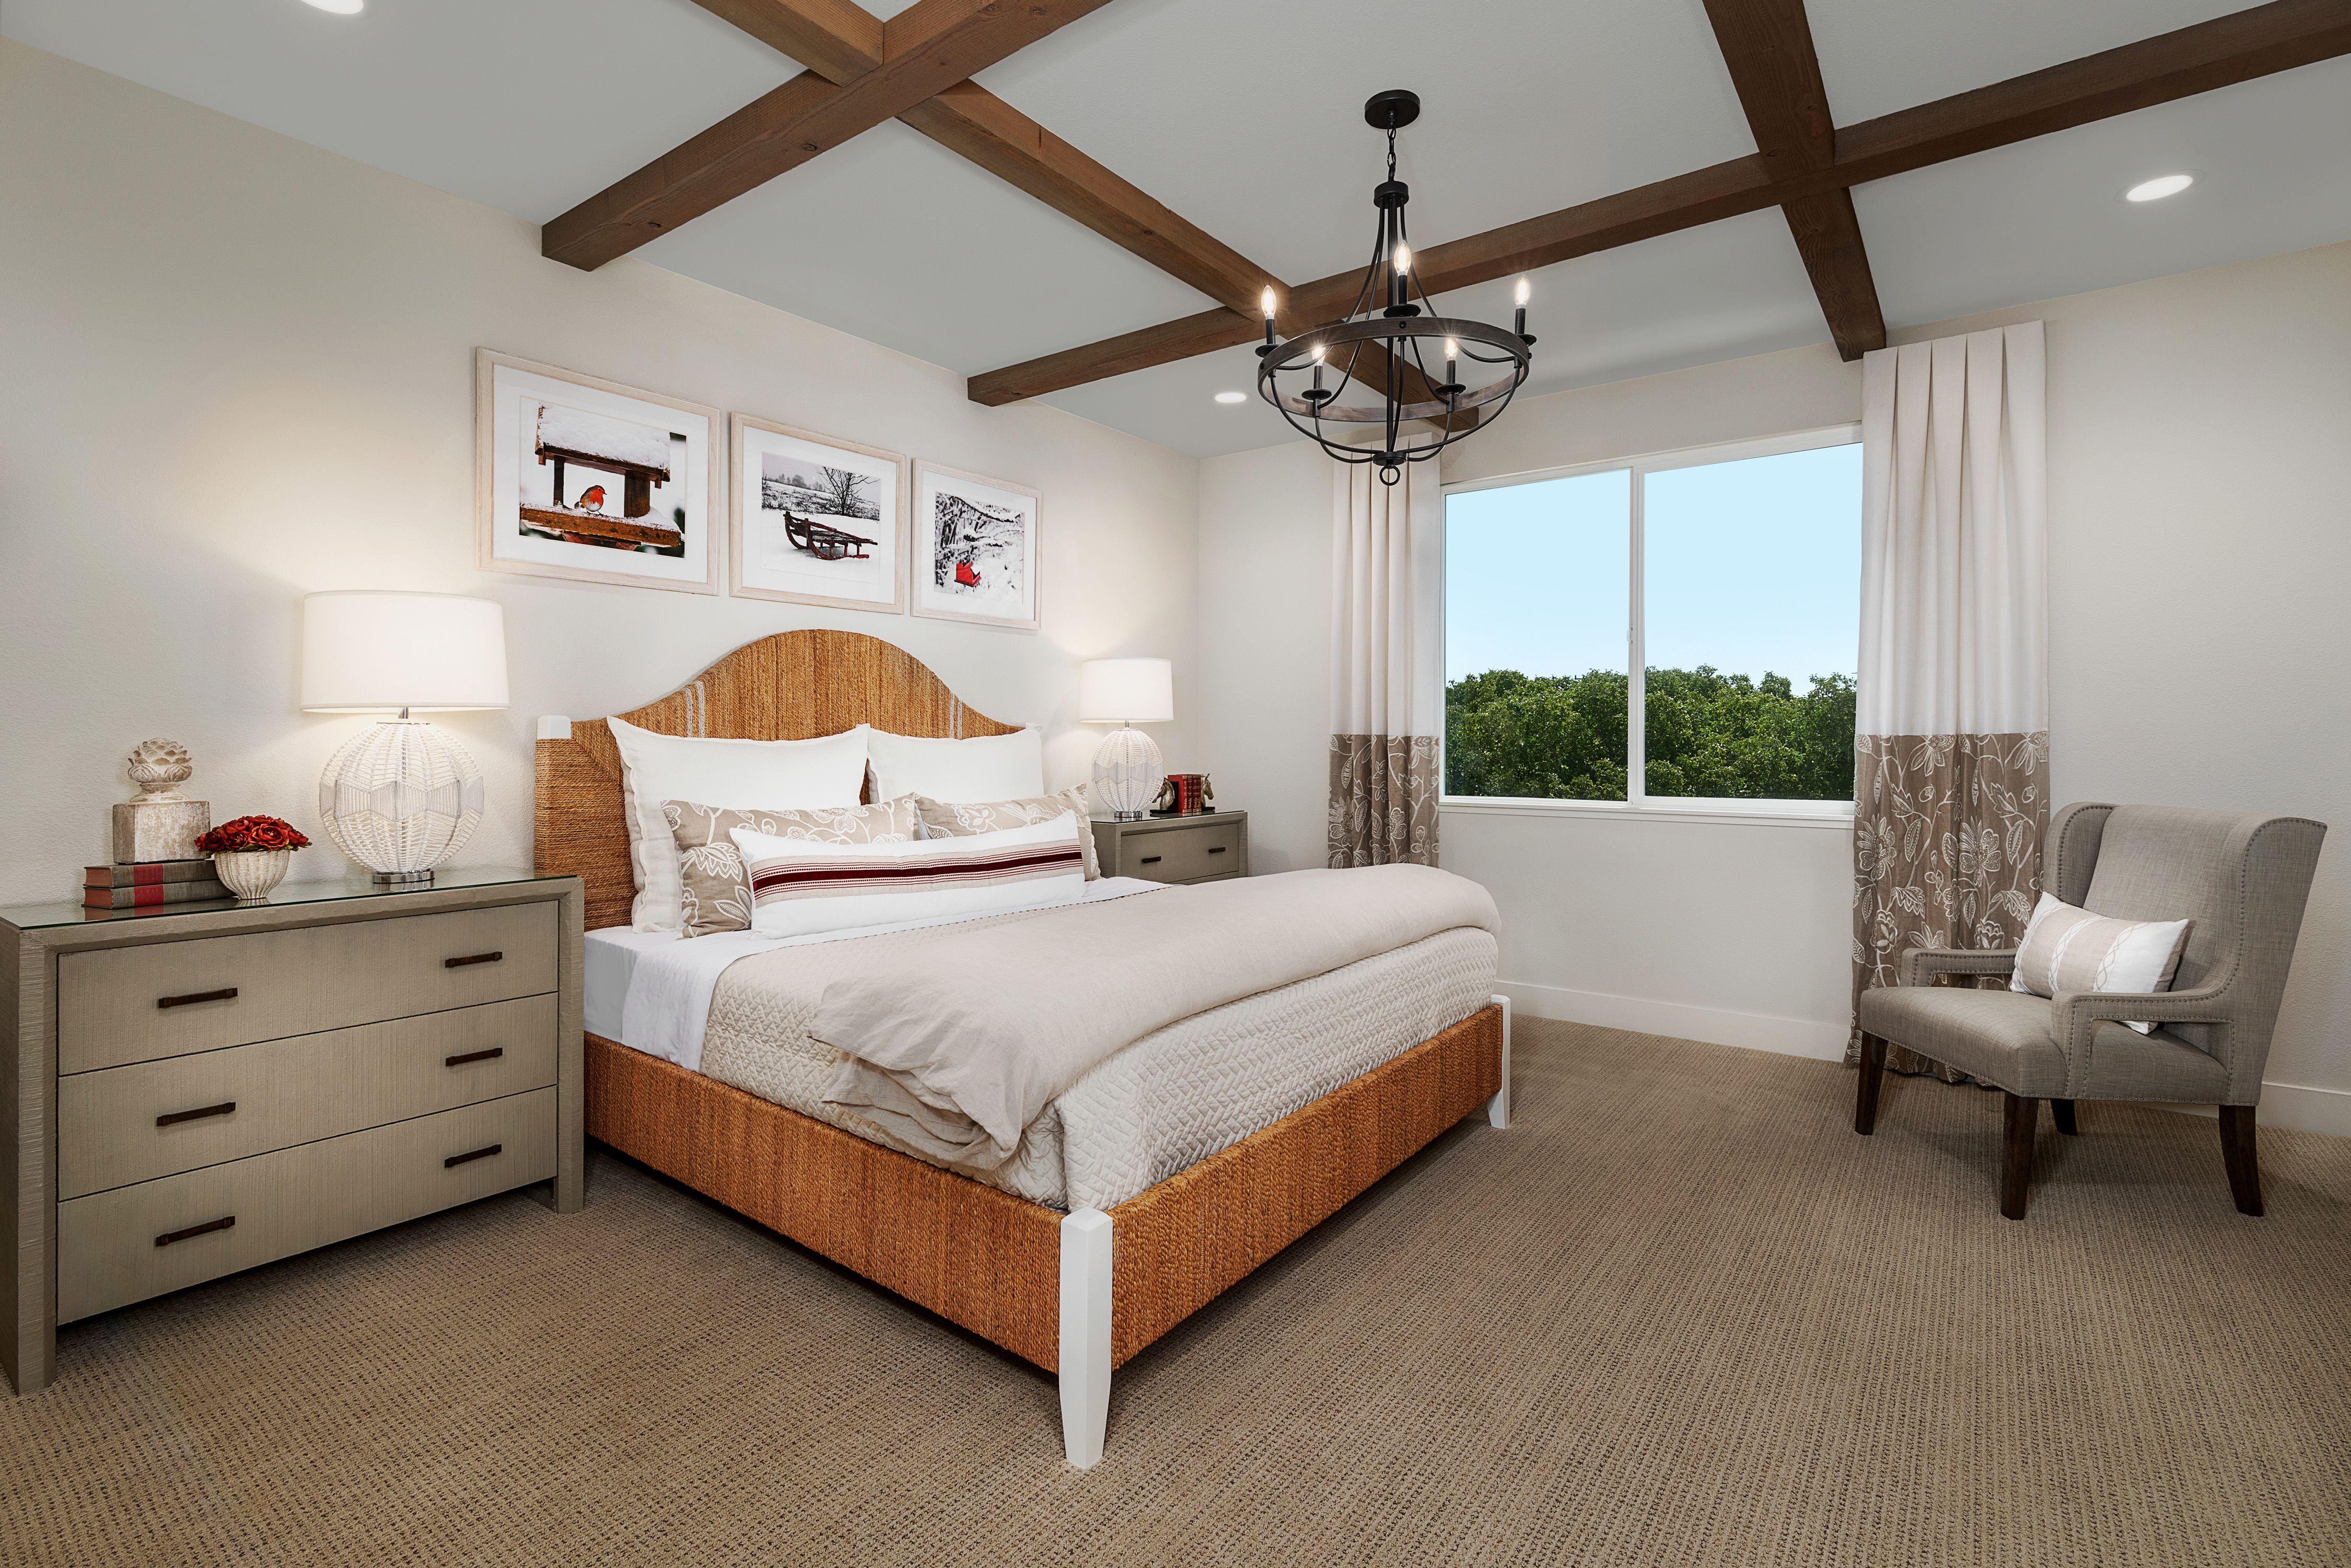 Bedroom featured in the Mayfair Residence 3 By Kiper Homes in Santa Cruz, CA